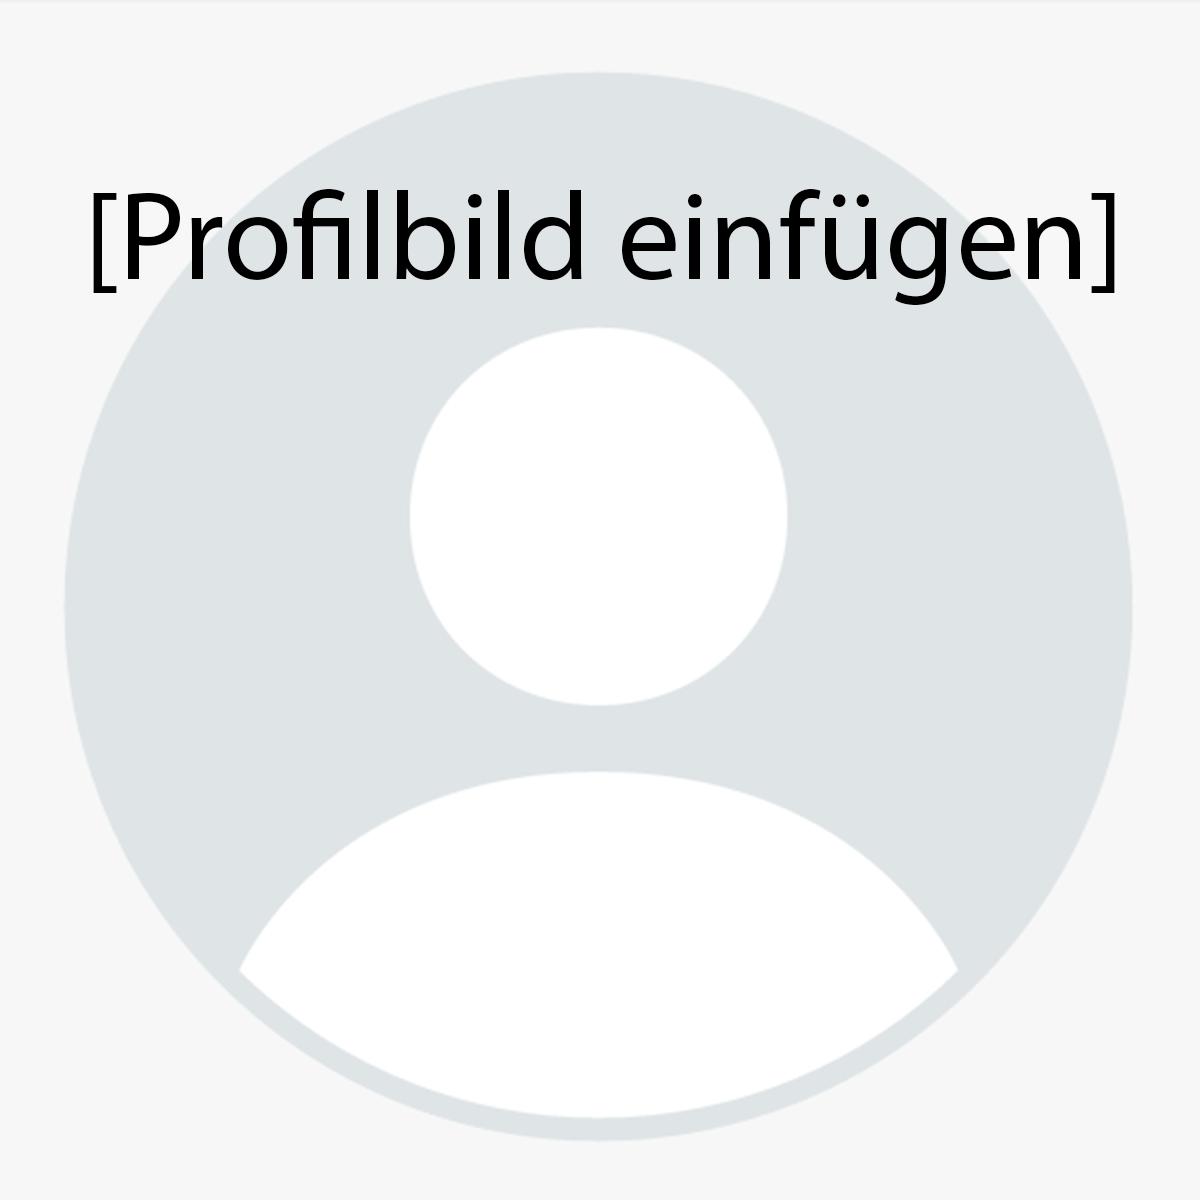 Whatsapp Kein Profilbild